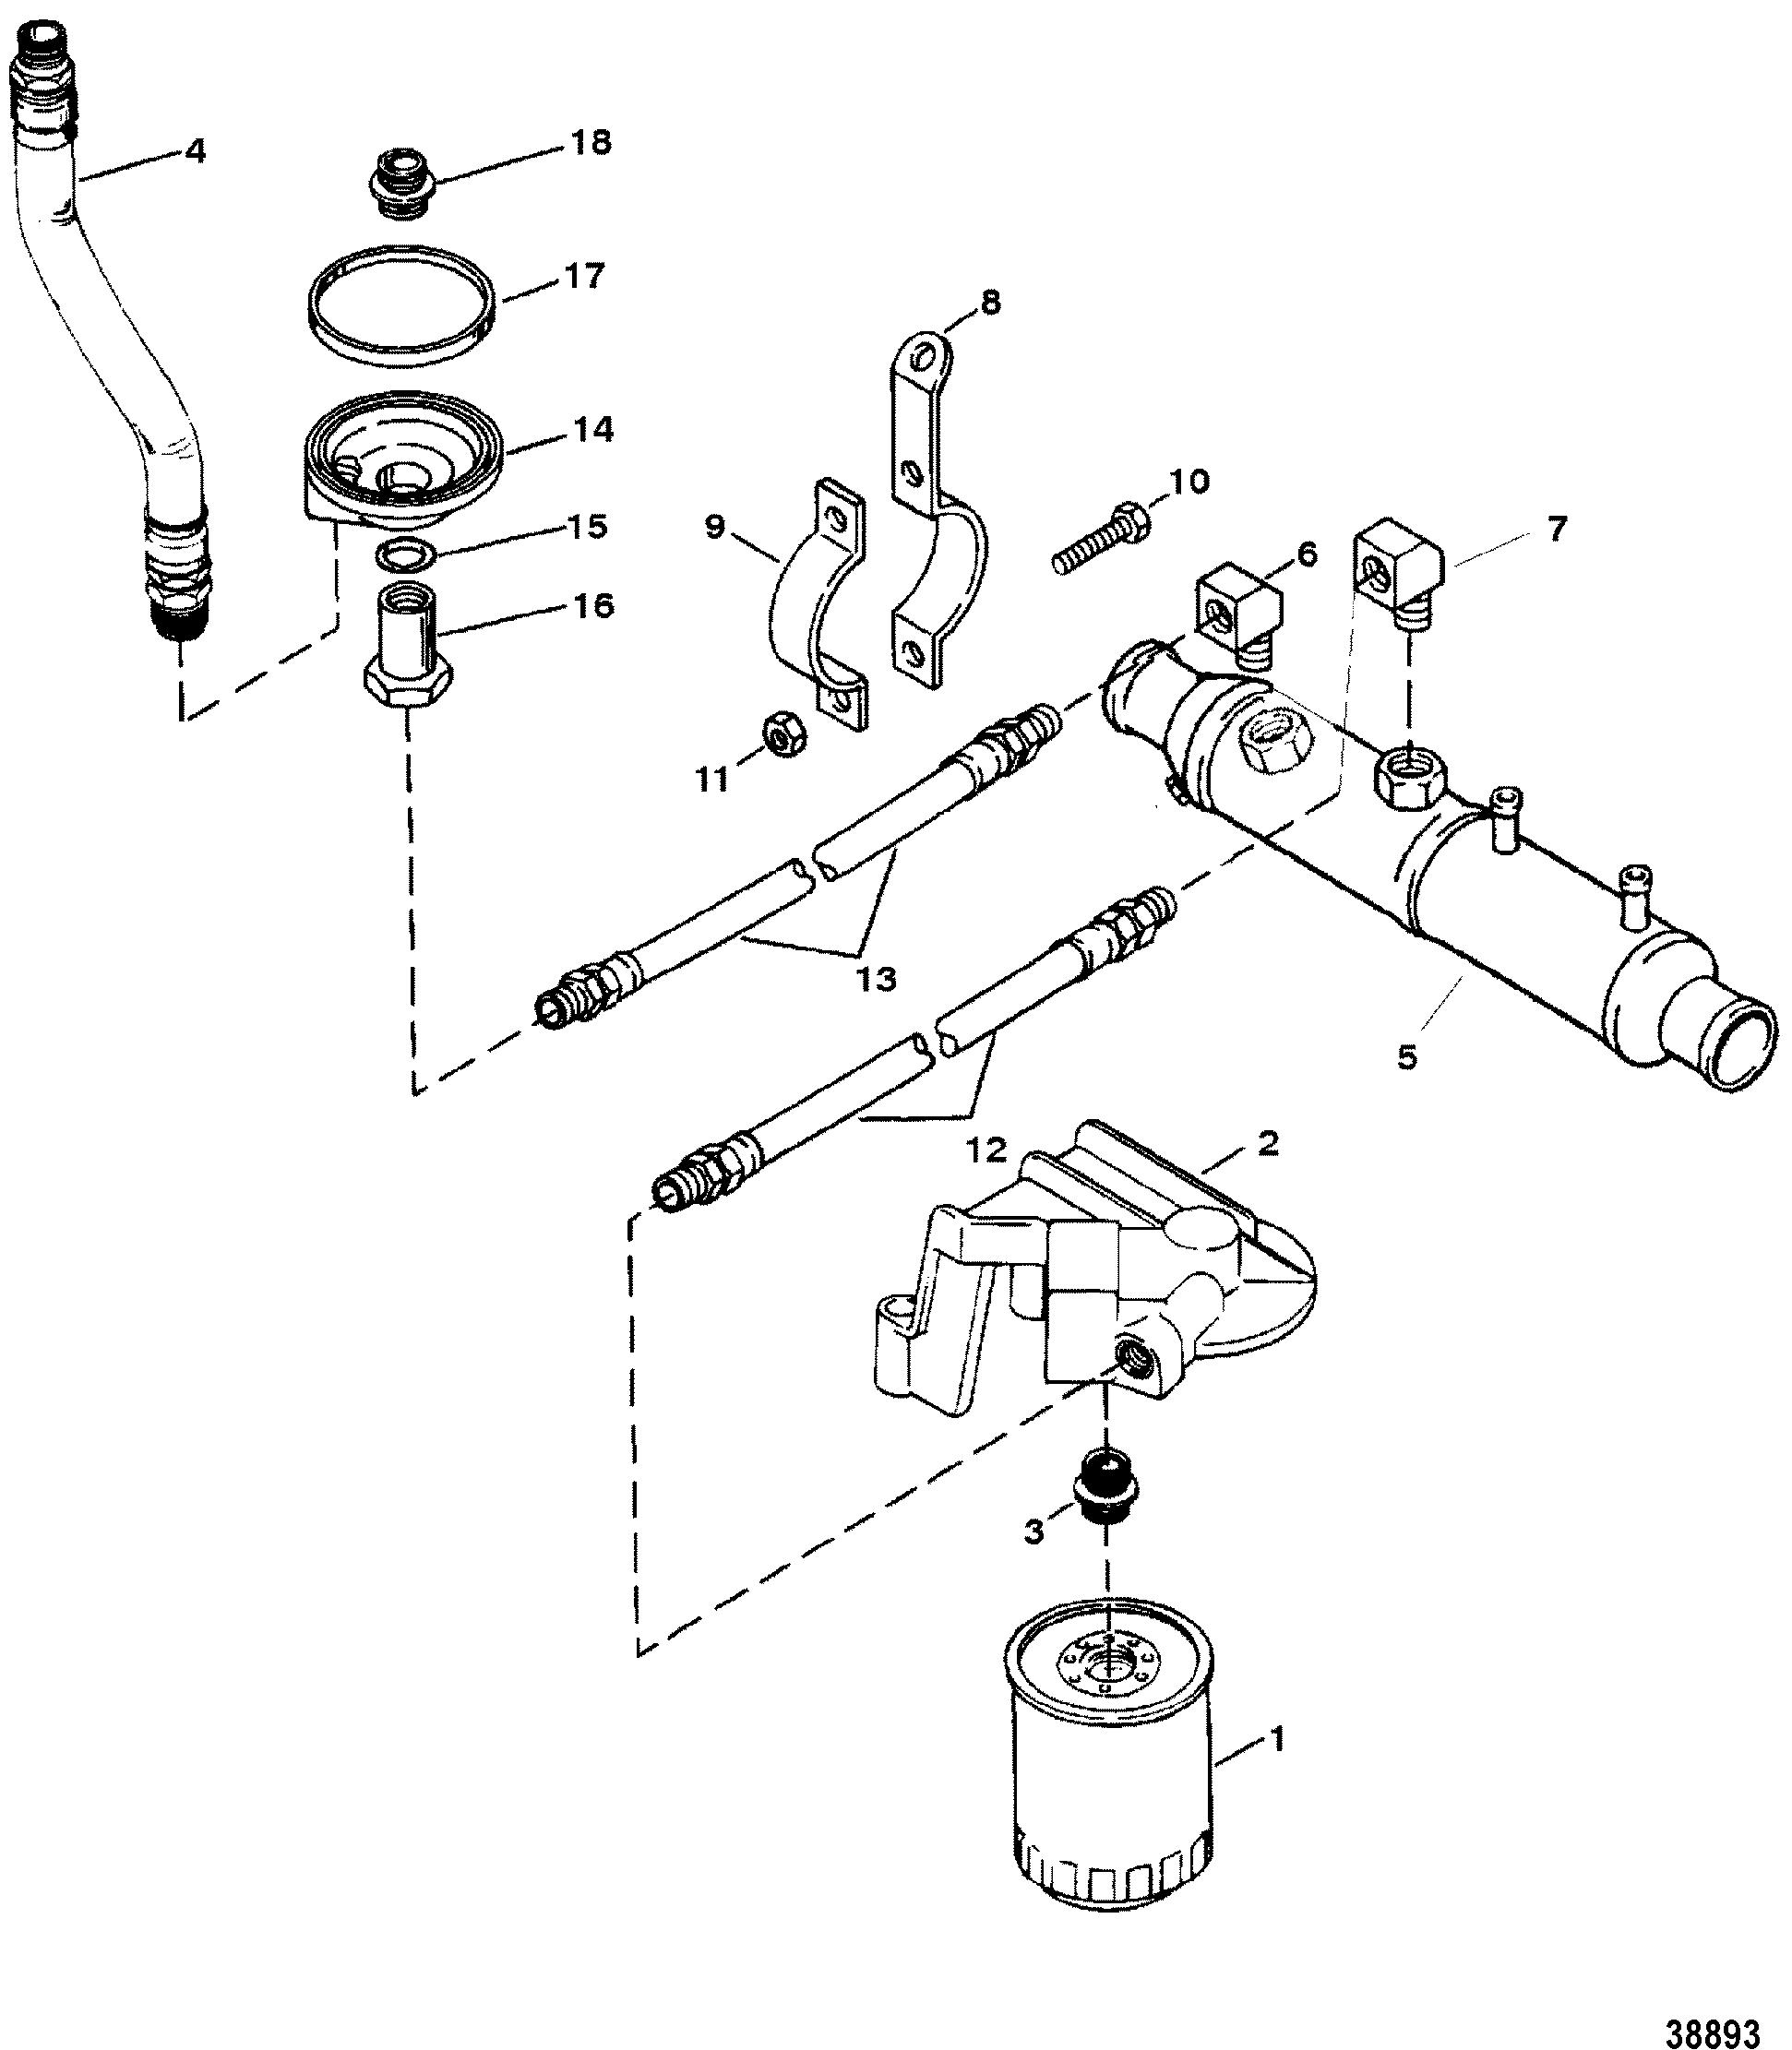 Oil Filter And Adaptor 7 4l Bravo S N 0f114759 Amp Below For